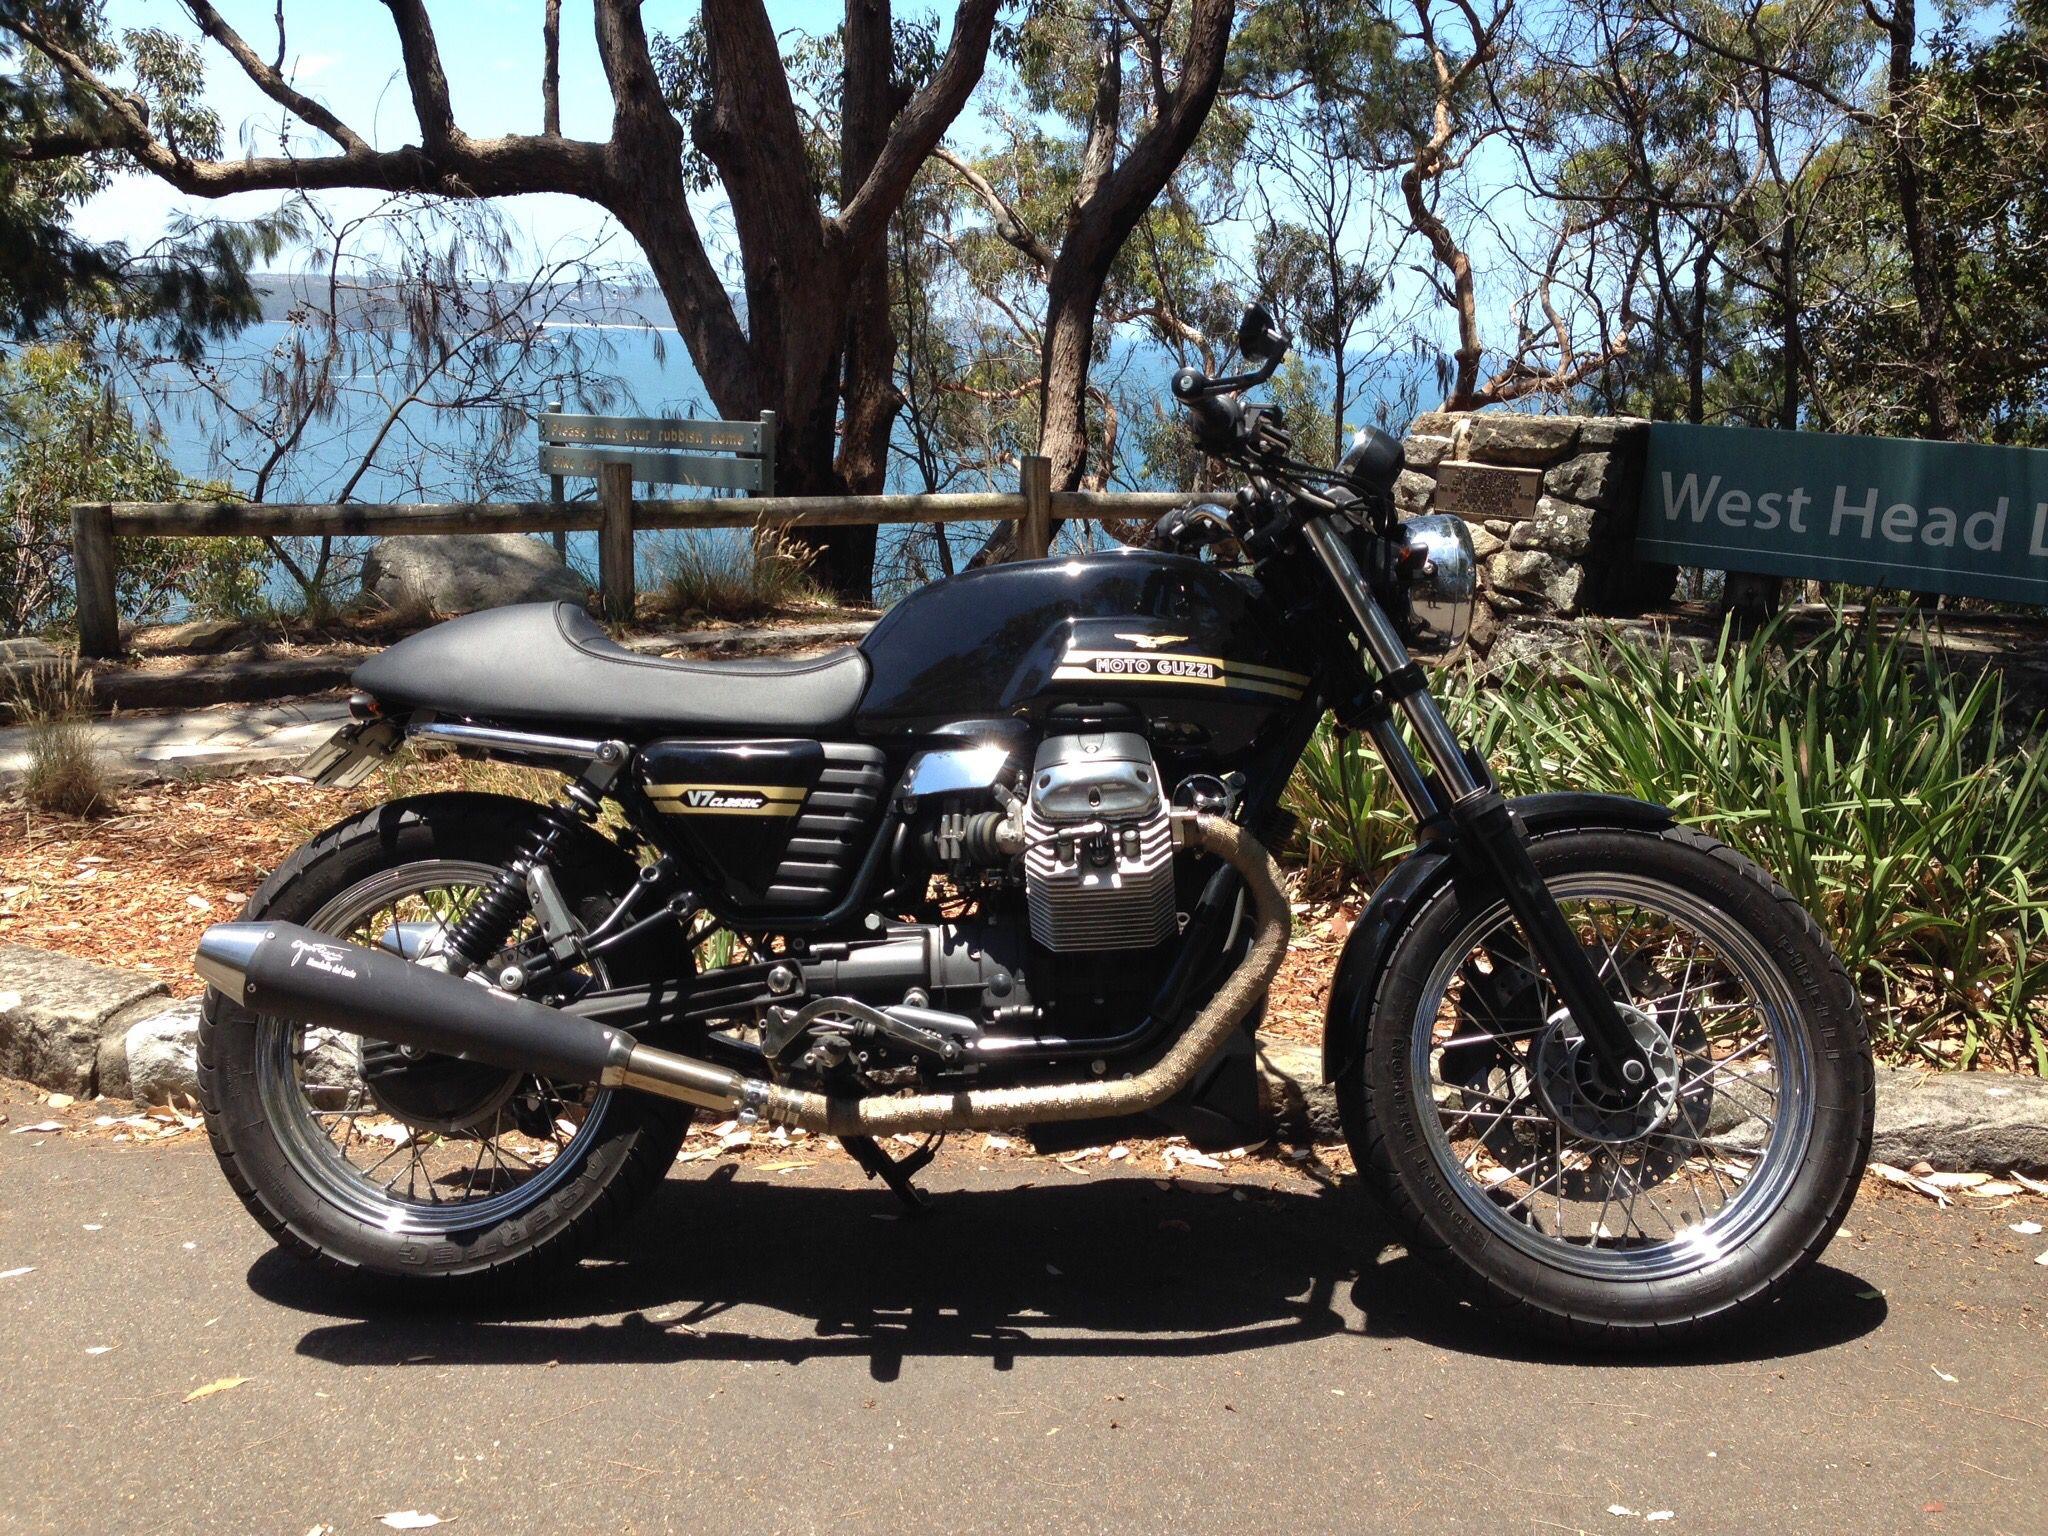 moto guzzi v7 classic with mas fender eliminator moto. Black Bedroom Furniture Sets. Home Design Ideas